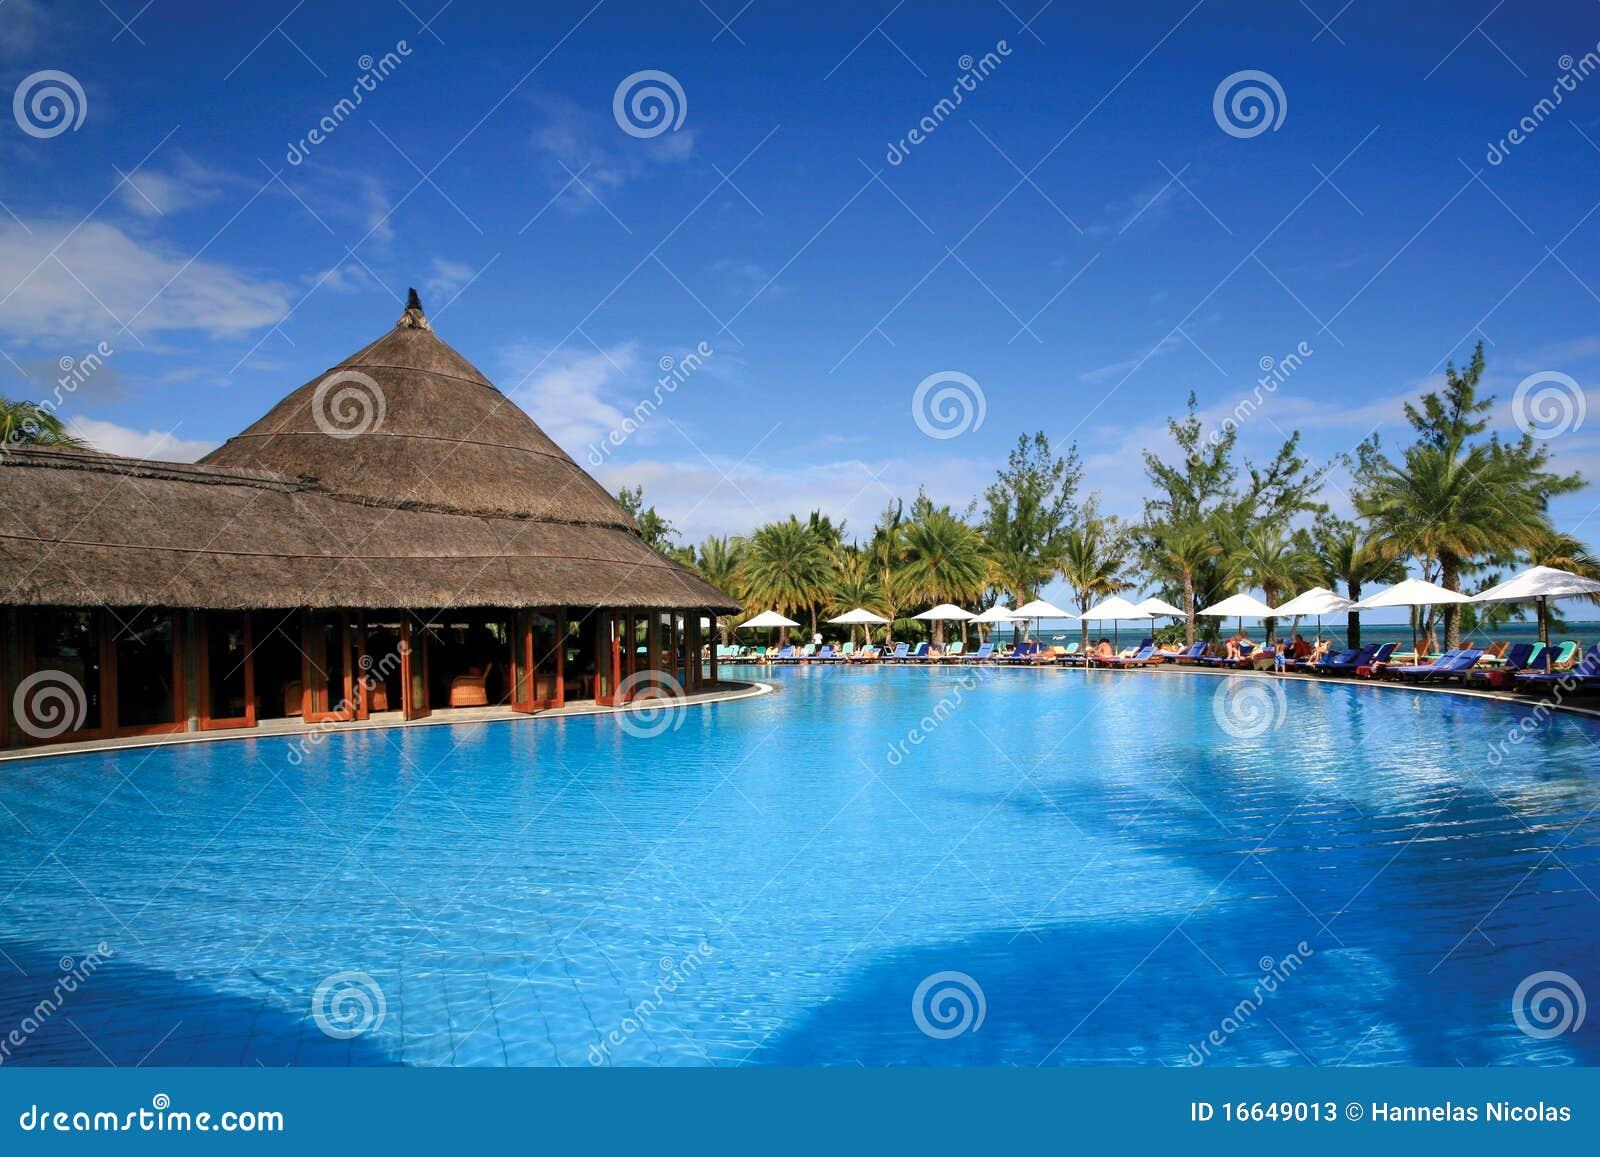 Resort swimming pool in mauritius stock photos image for Swimming pool mauritius